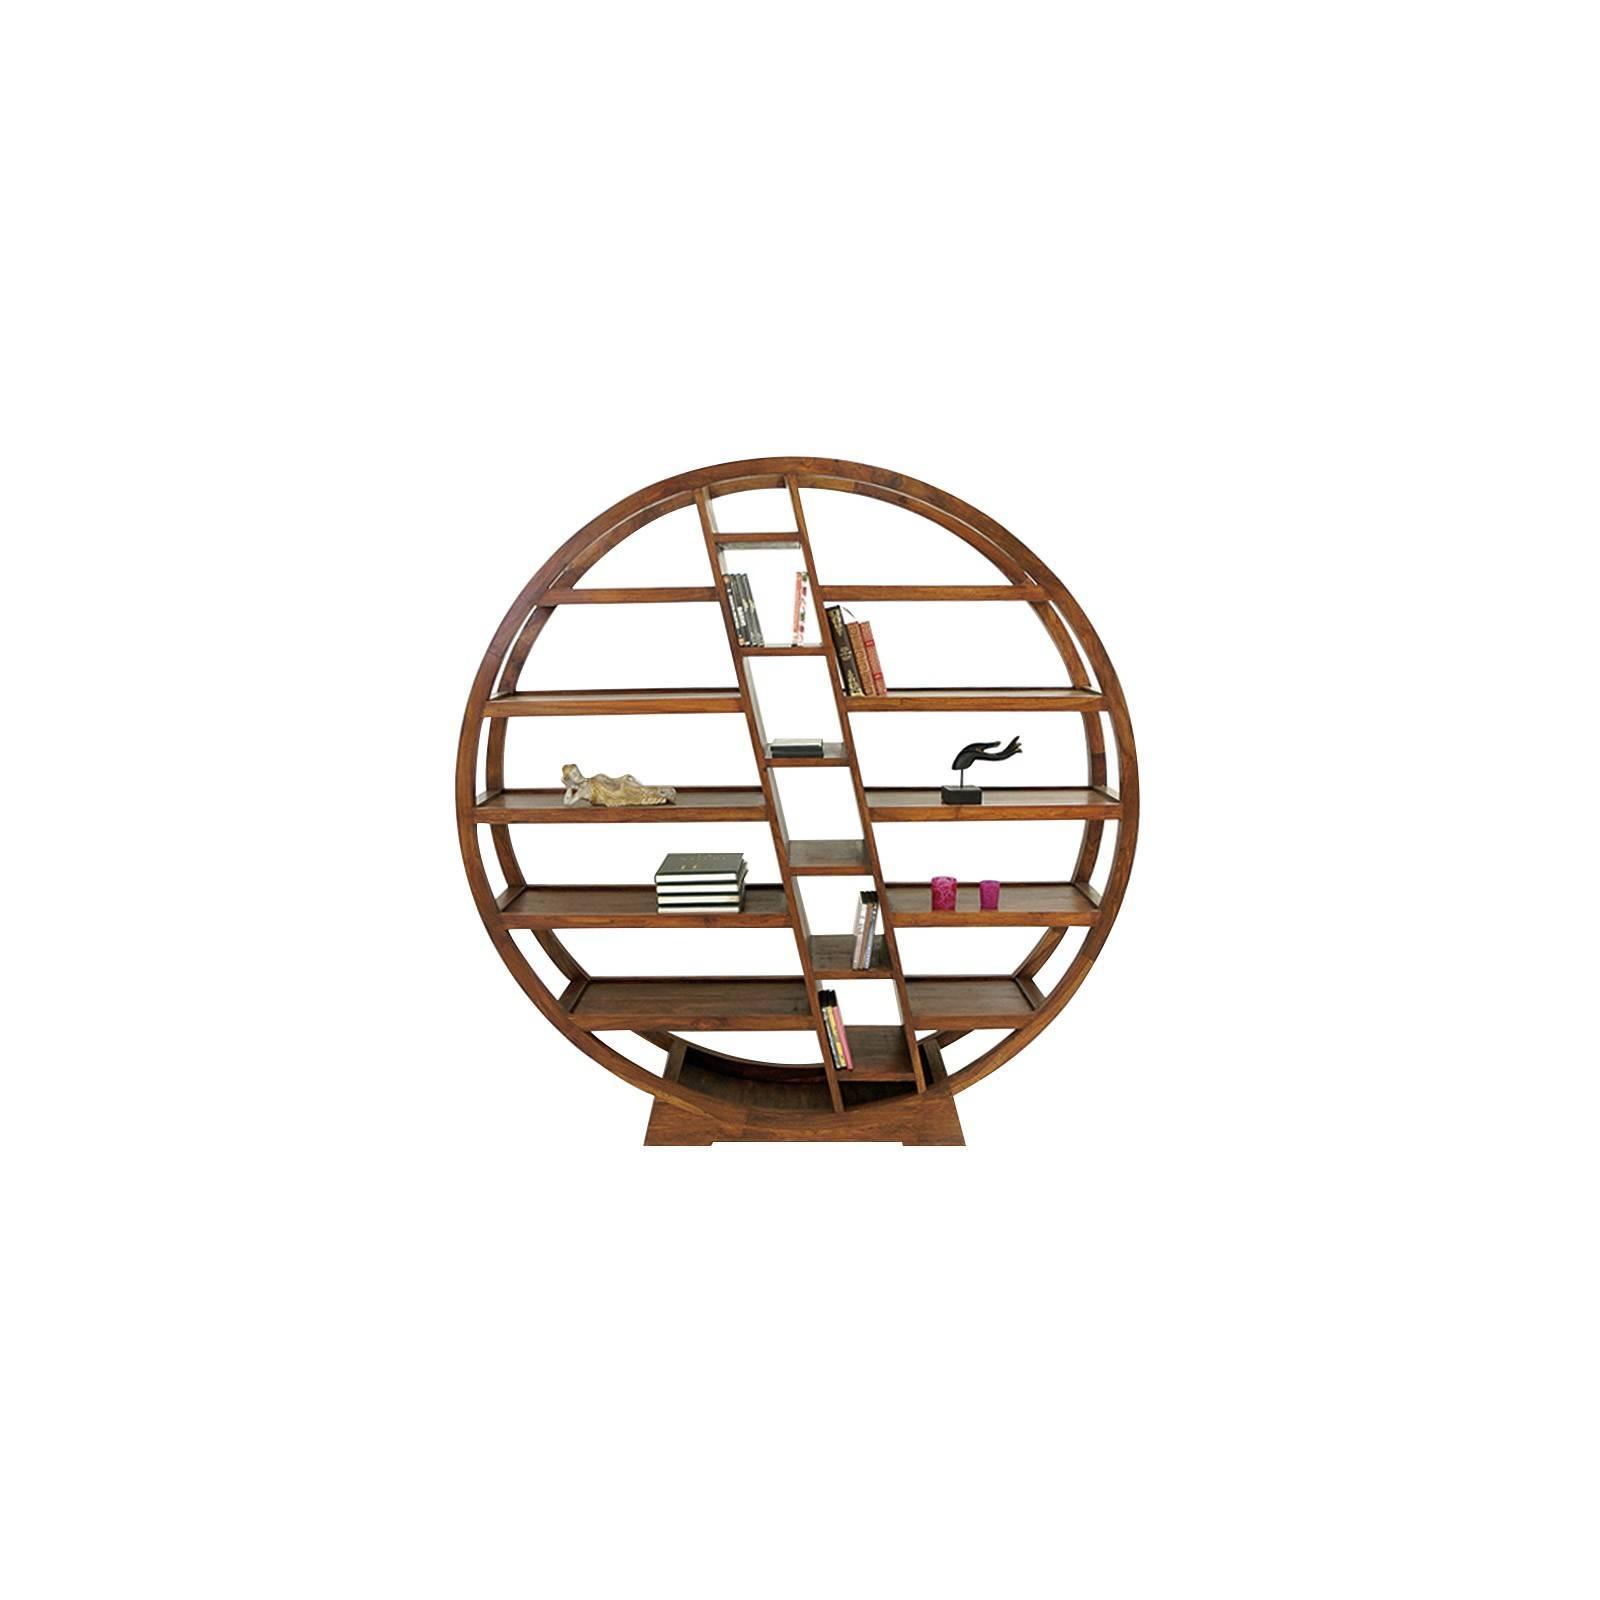 tag re ronde biblioth que originale lhassa fabrication. Black Bedroom Furniture Sets. Home Design Ideas